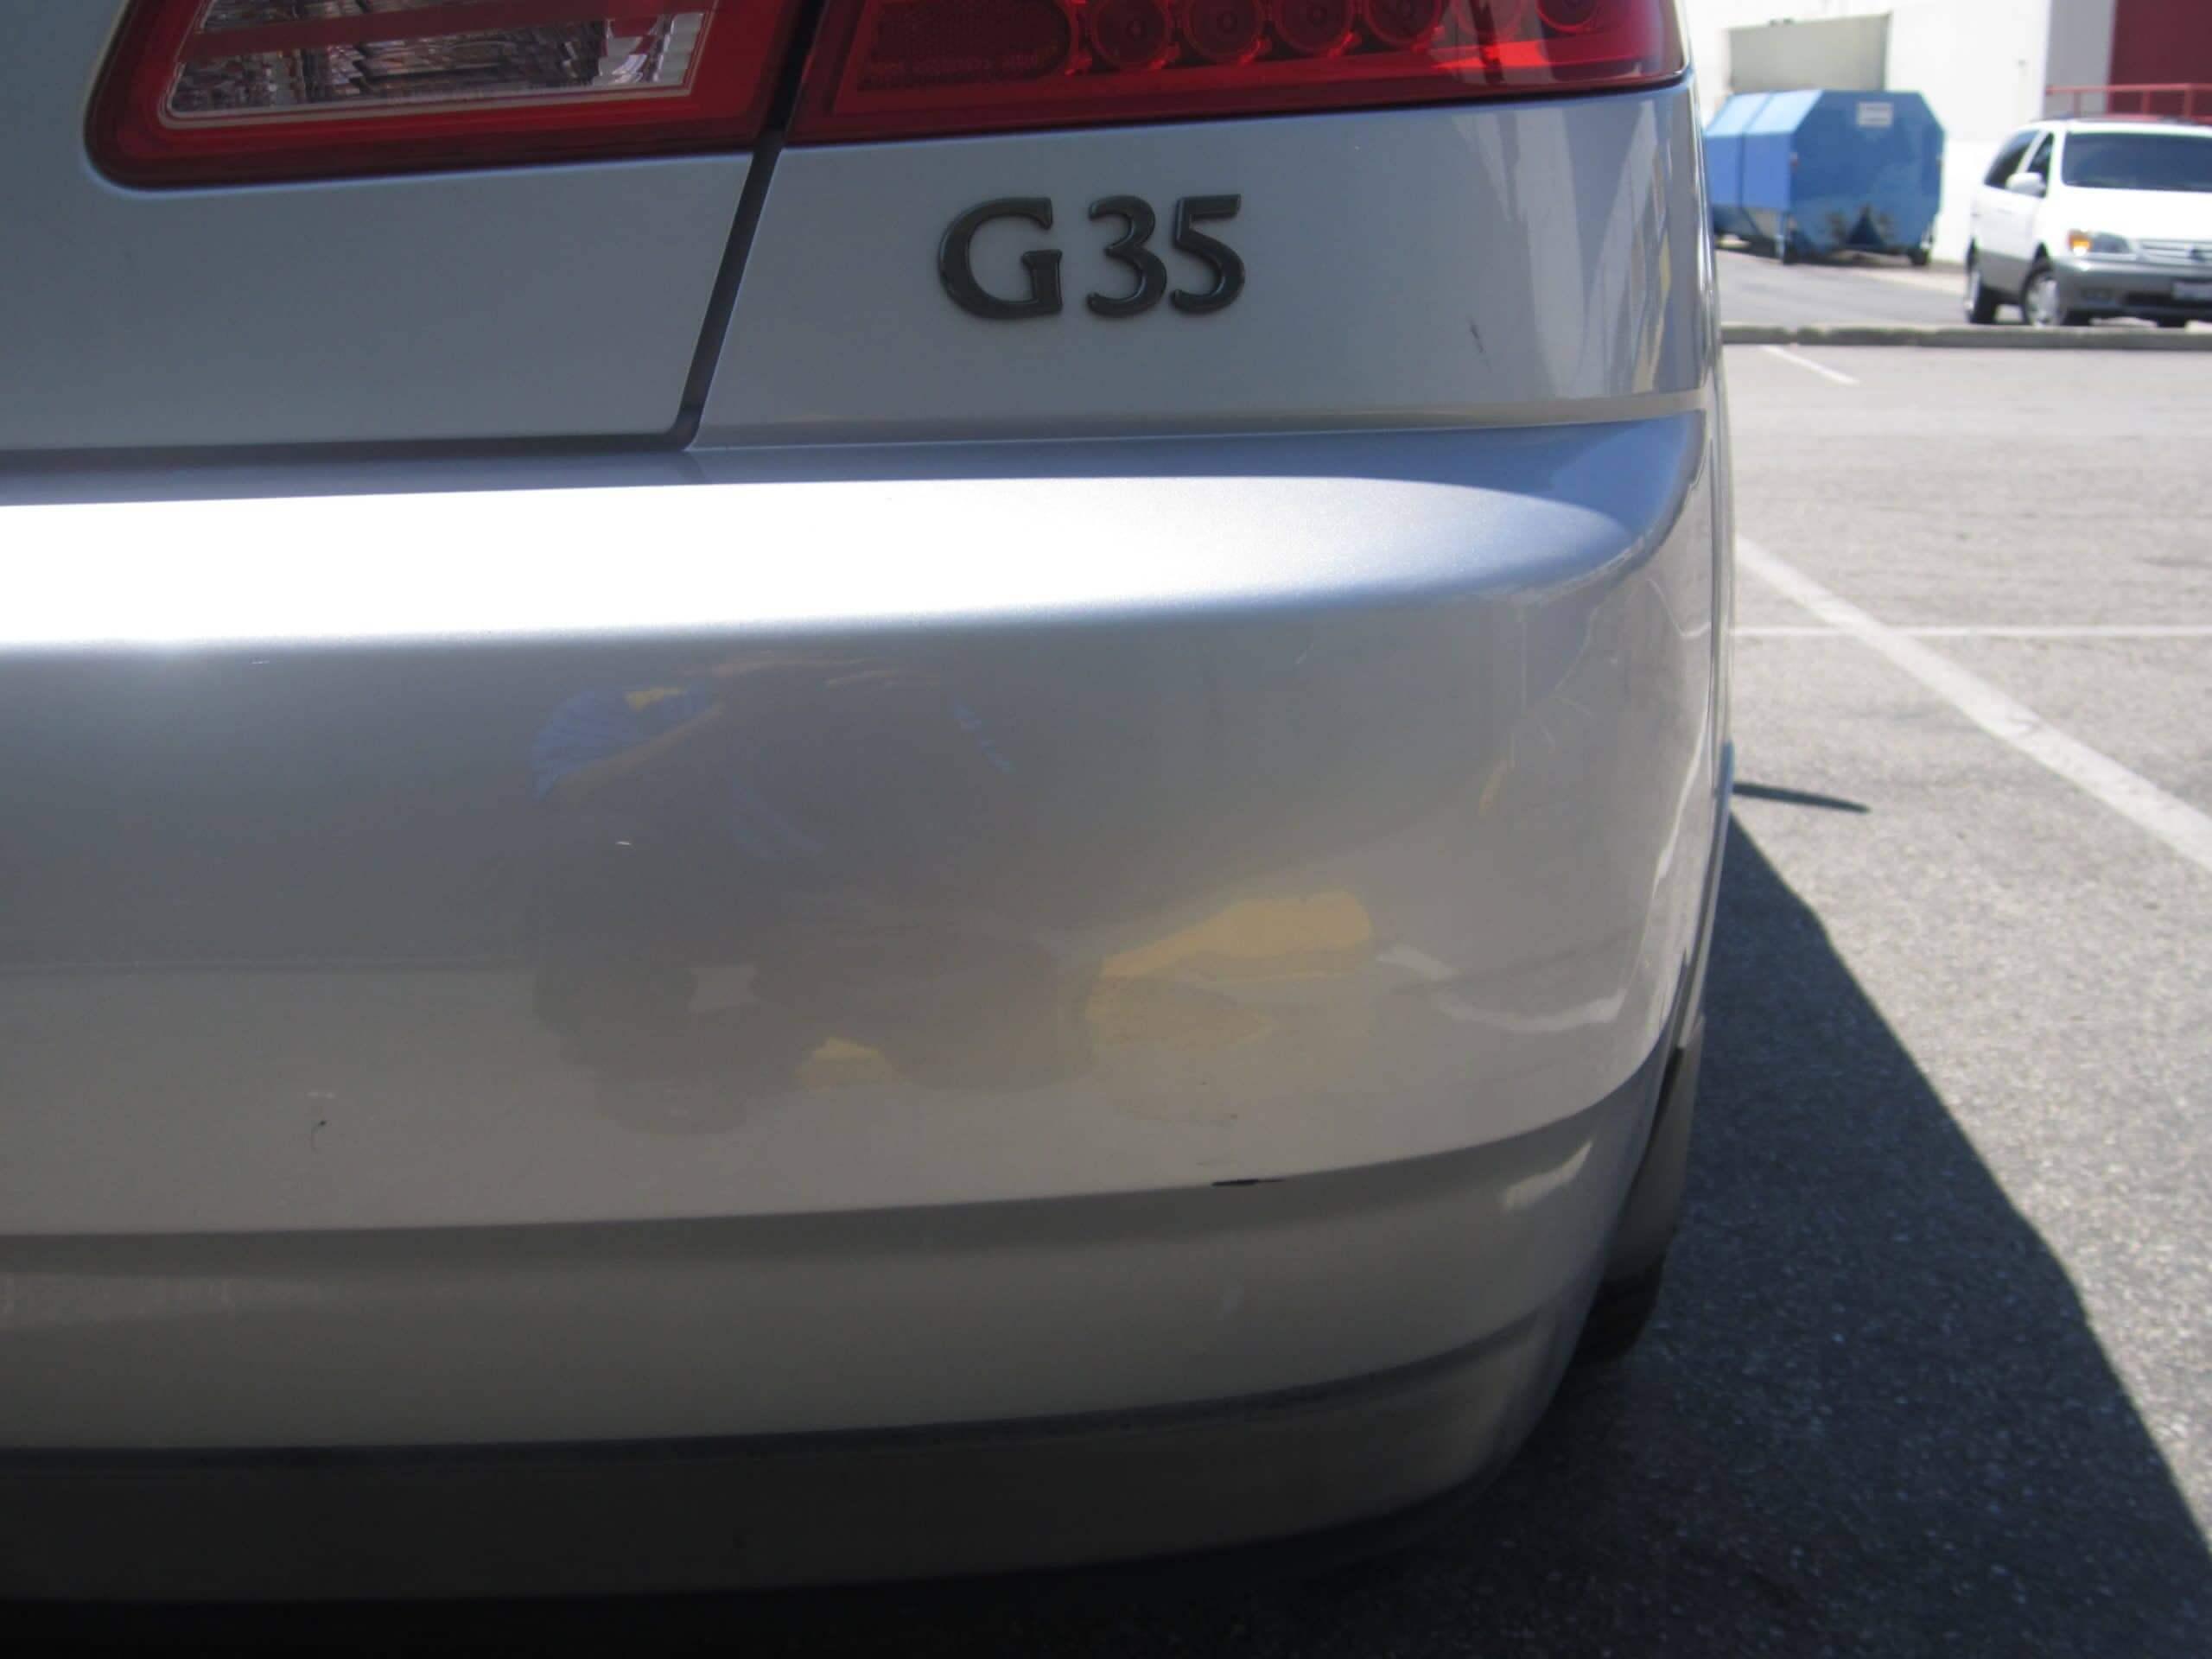 G35 Dent Removed